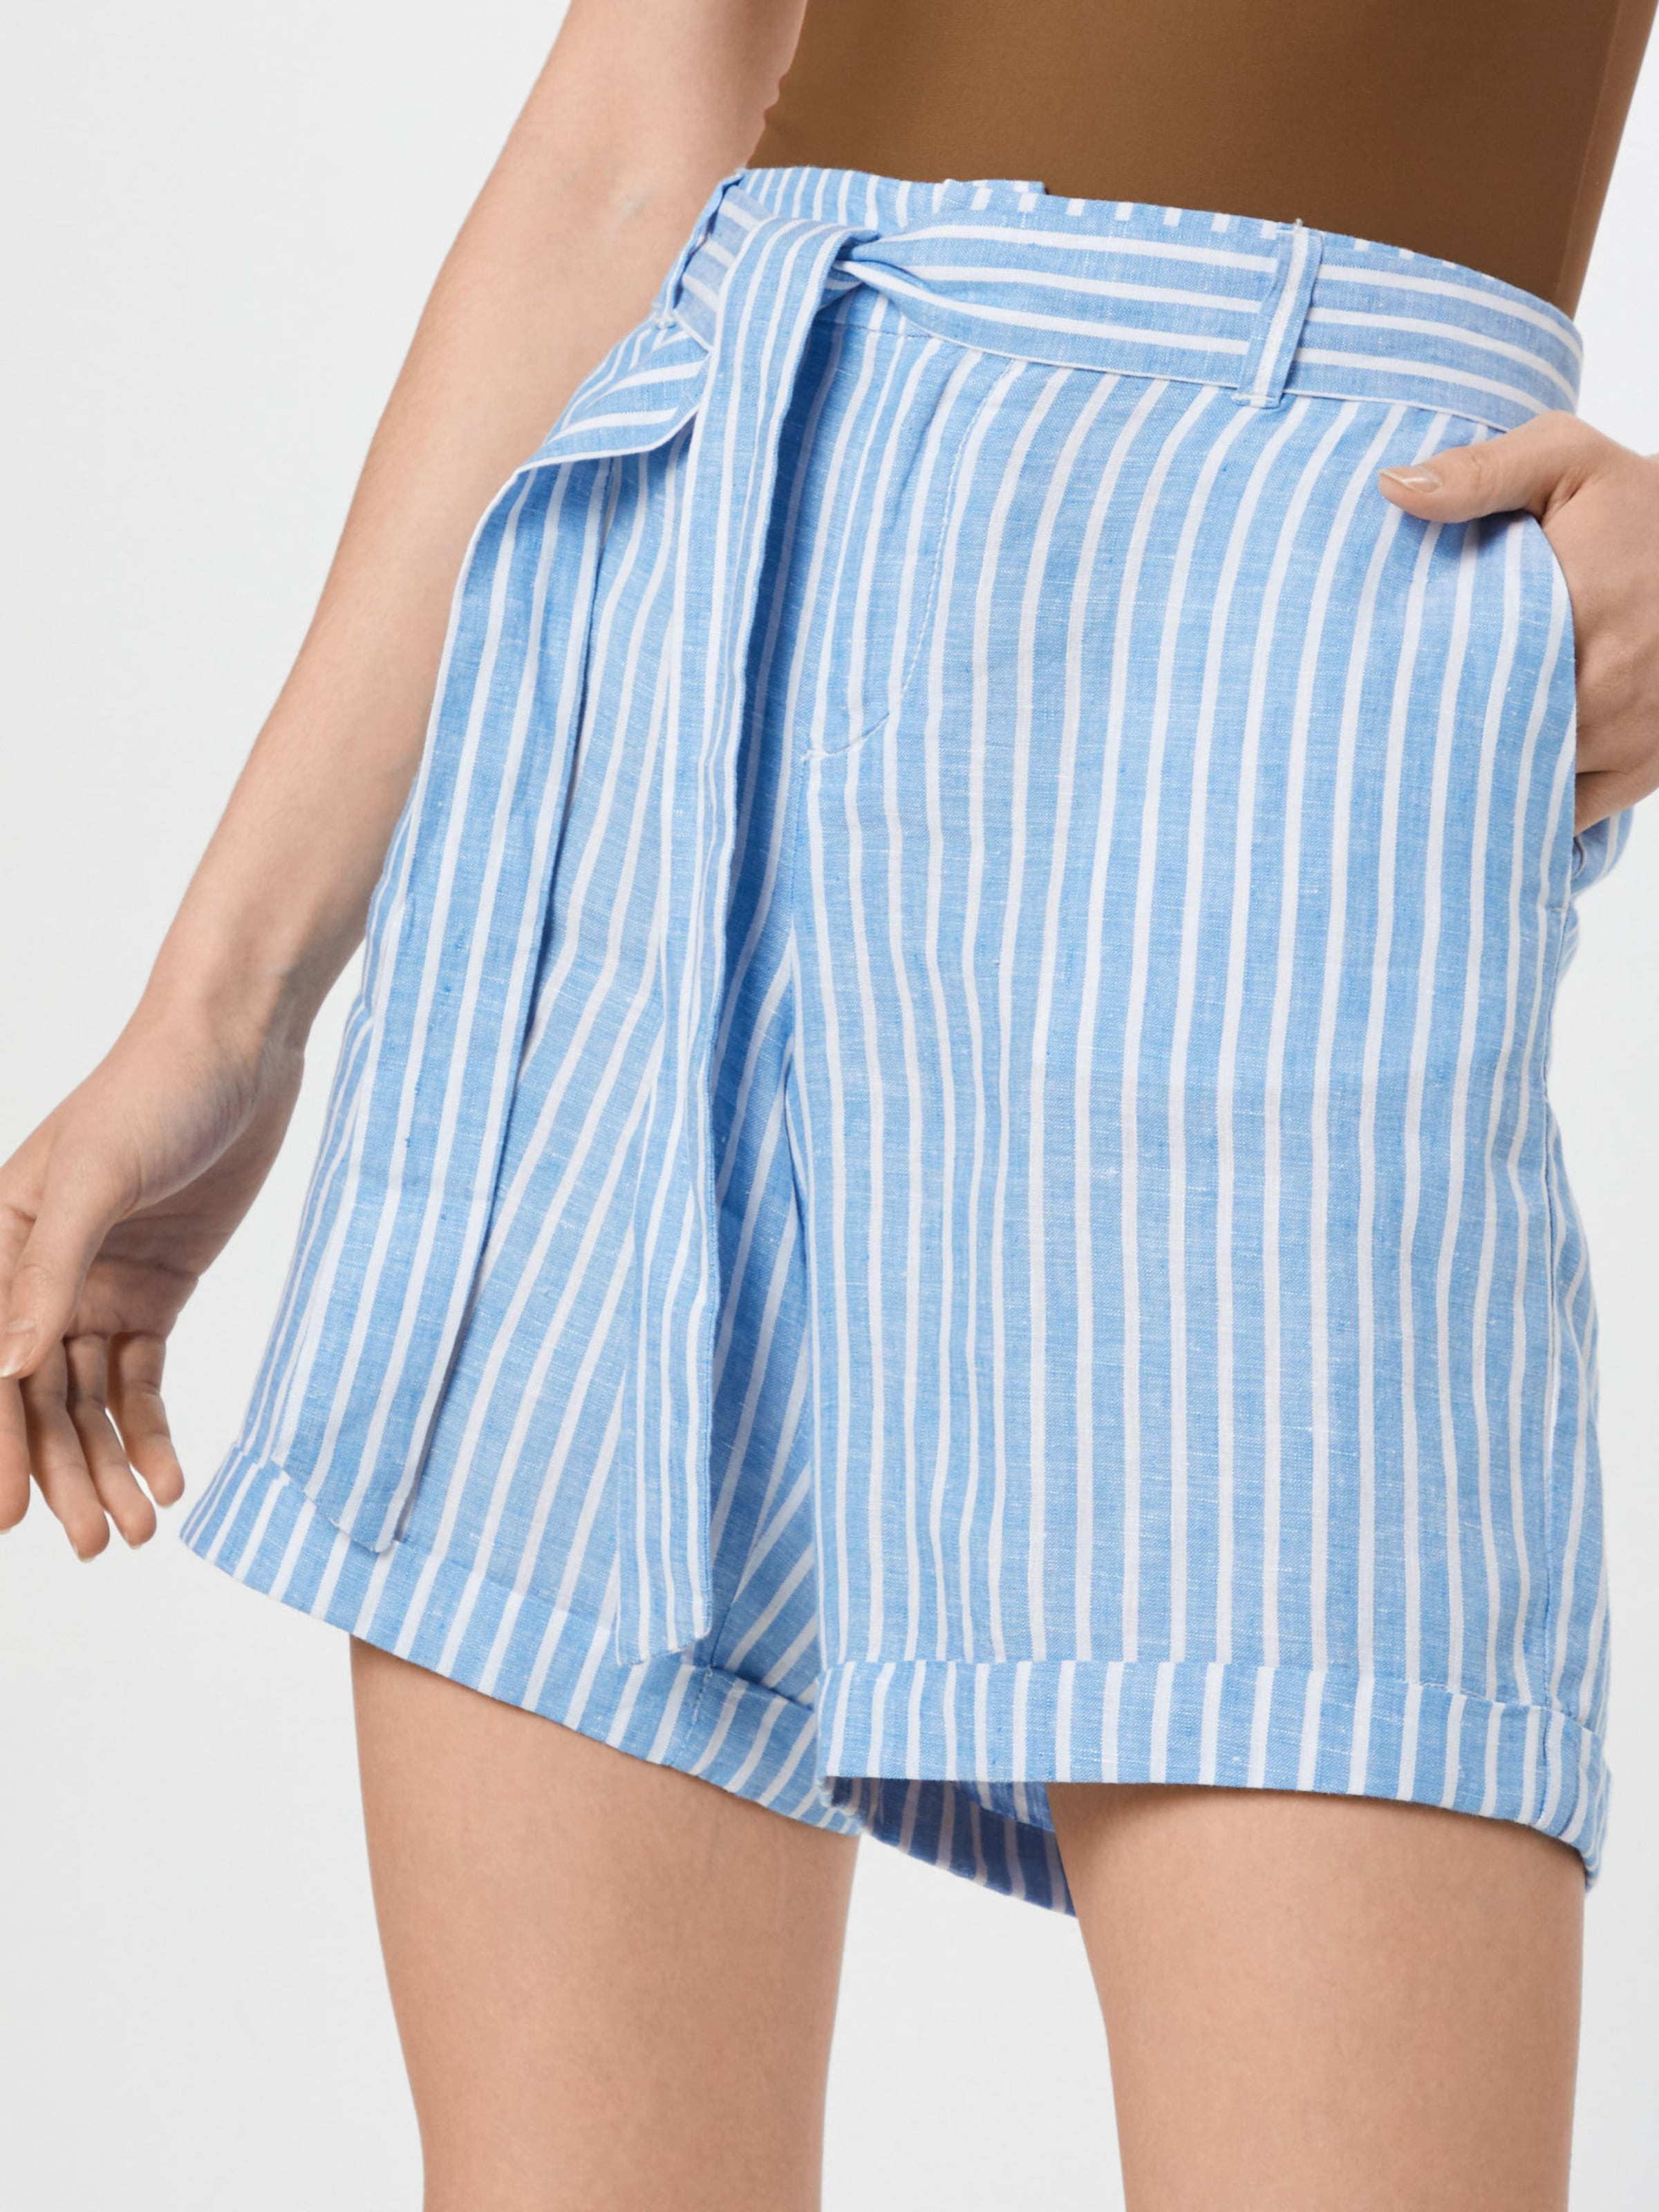 S Bleu ClairBlanc En Red Label oliver Pantalon 5j3RL4A